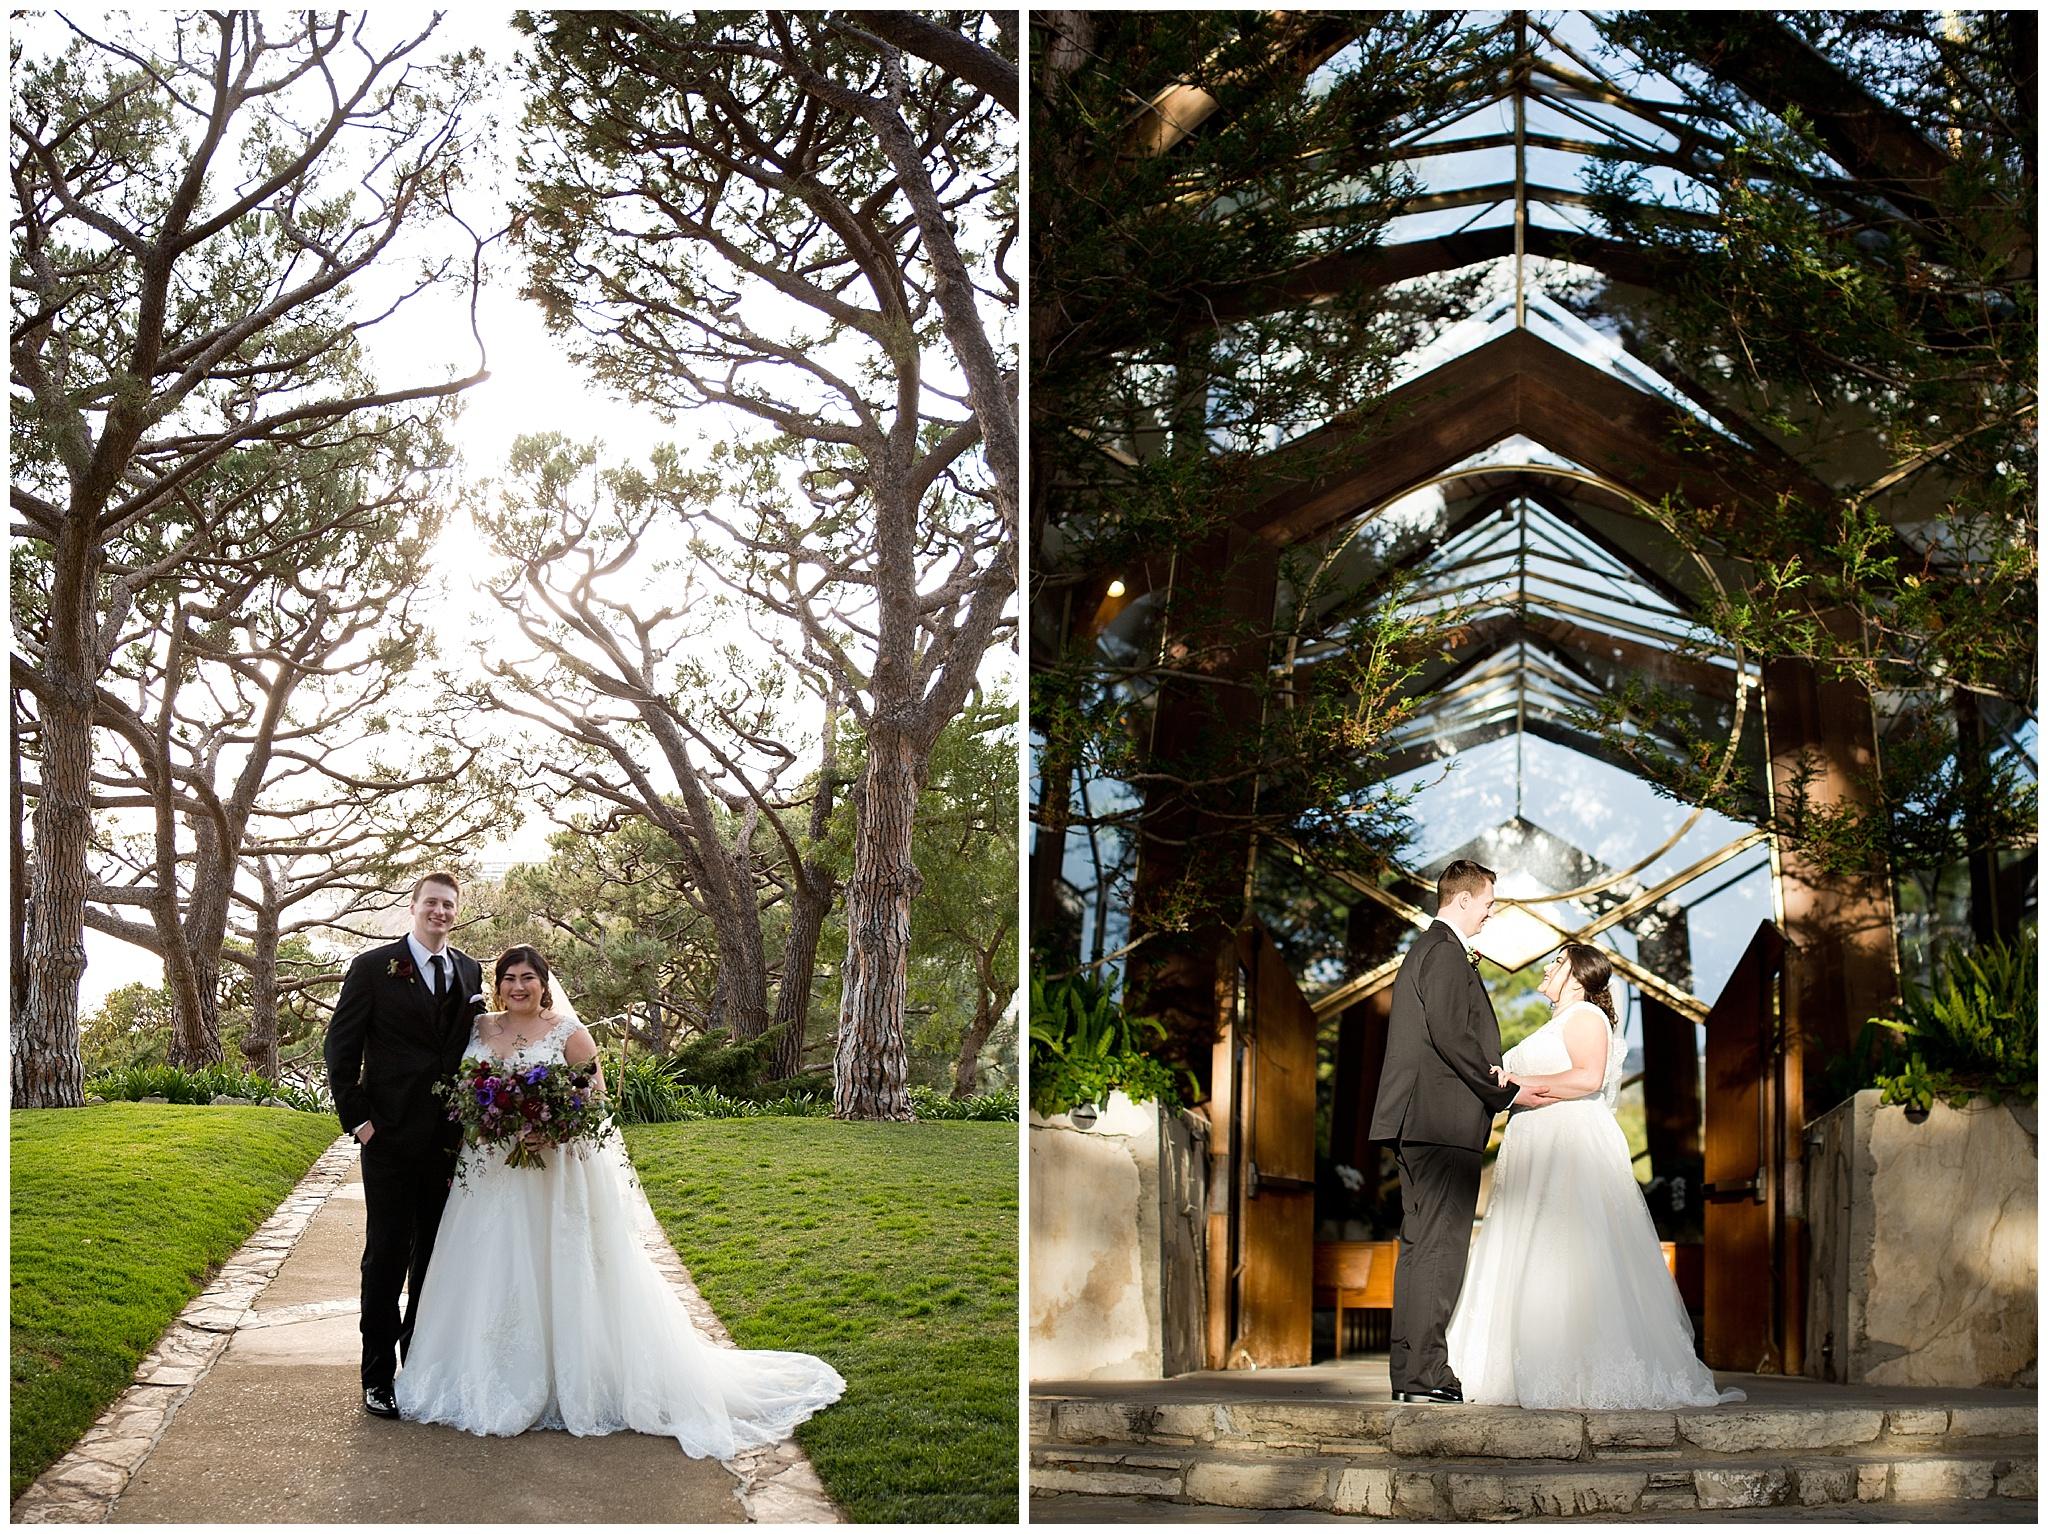 Carol_and_Grant_Wedding_3-3-18-8218.jpg